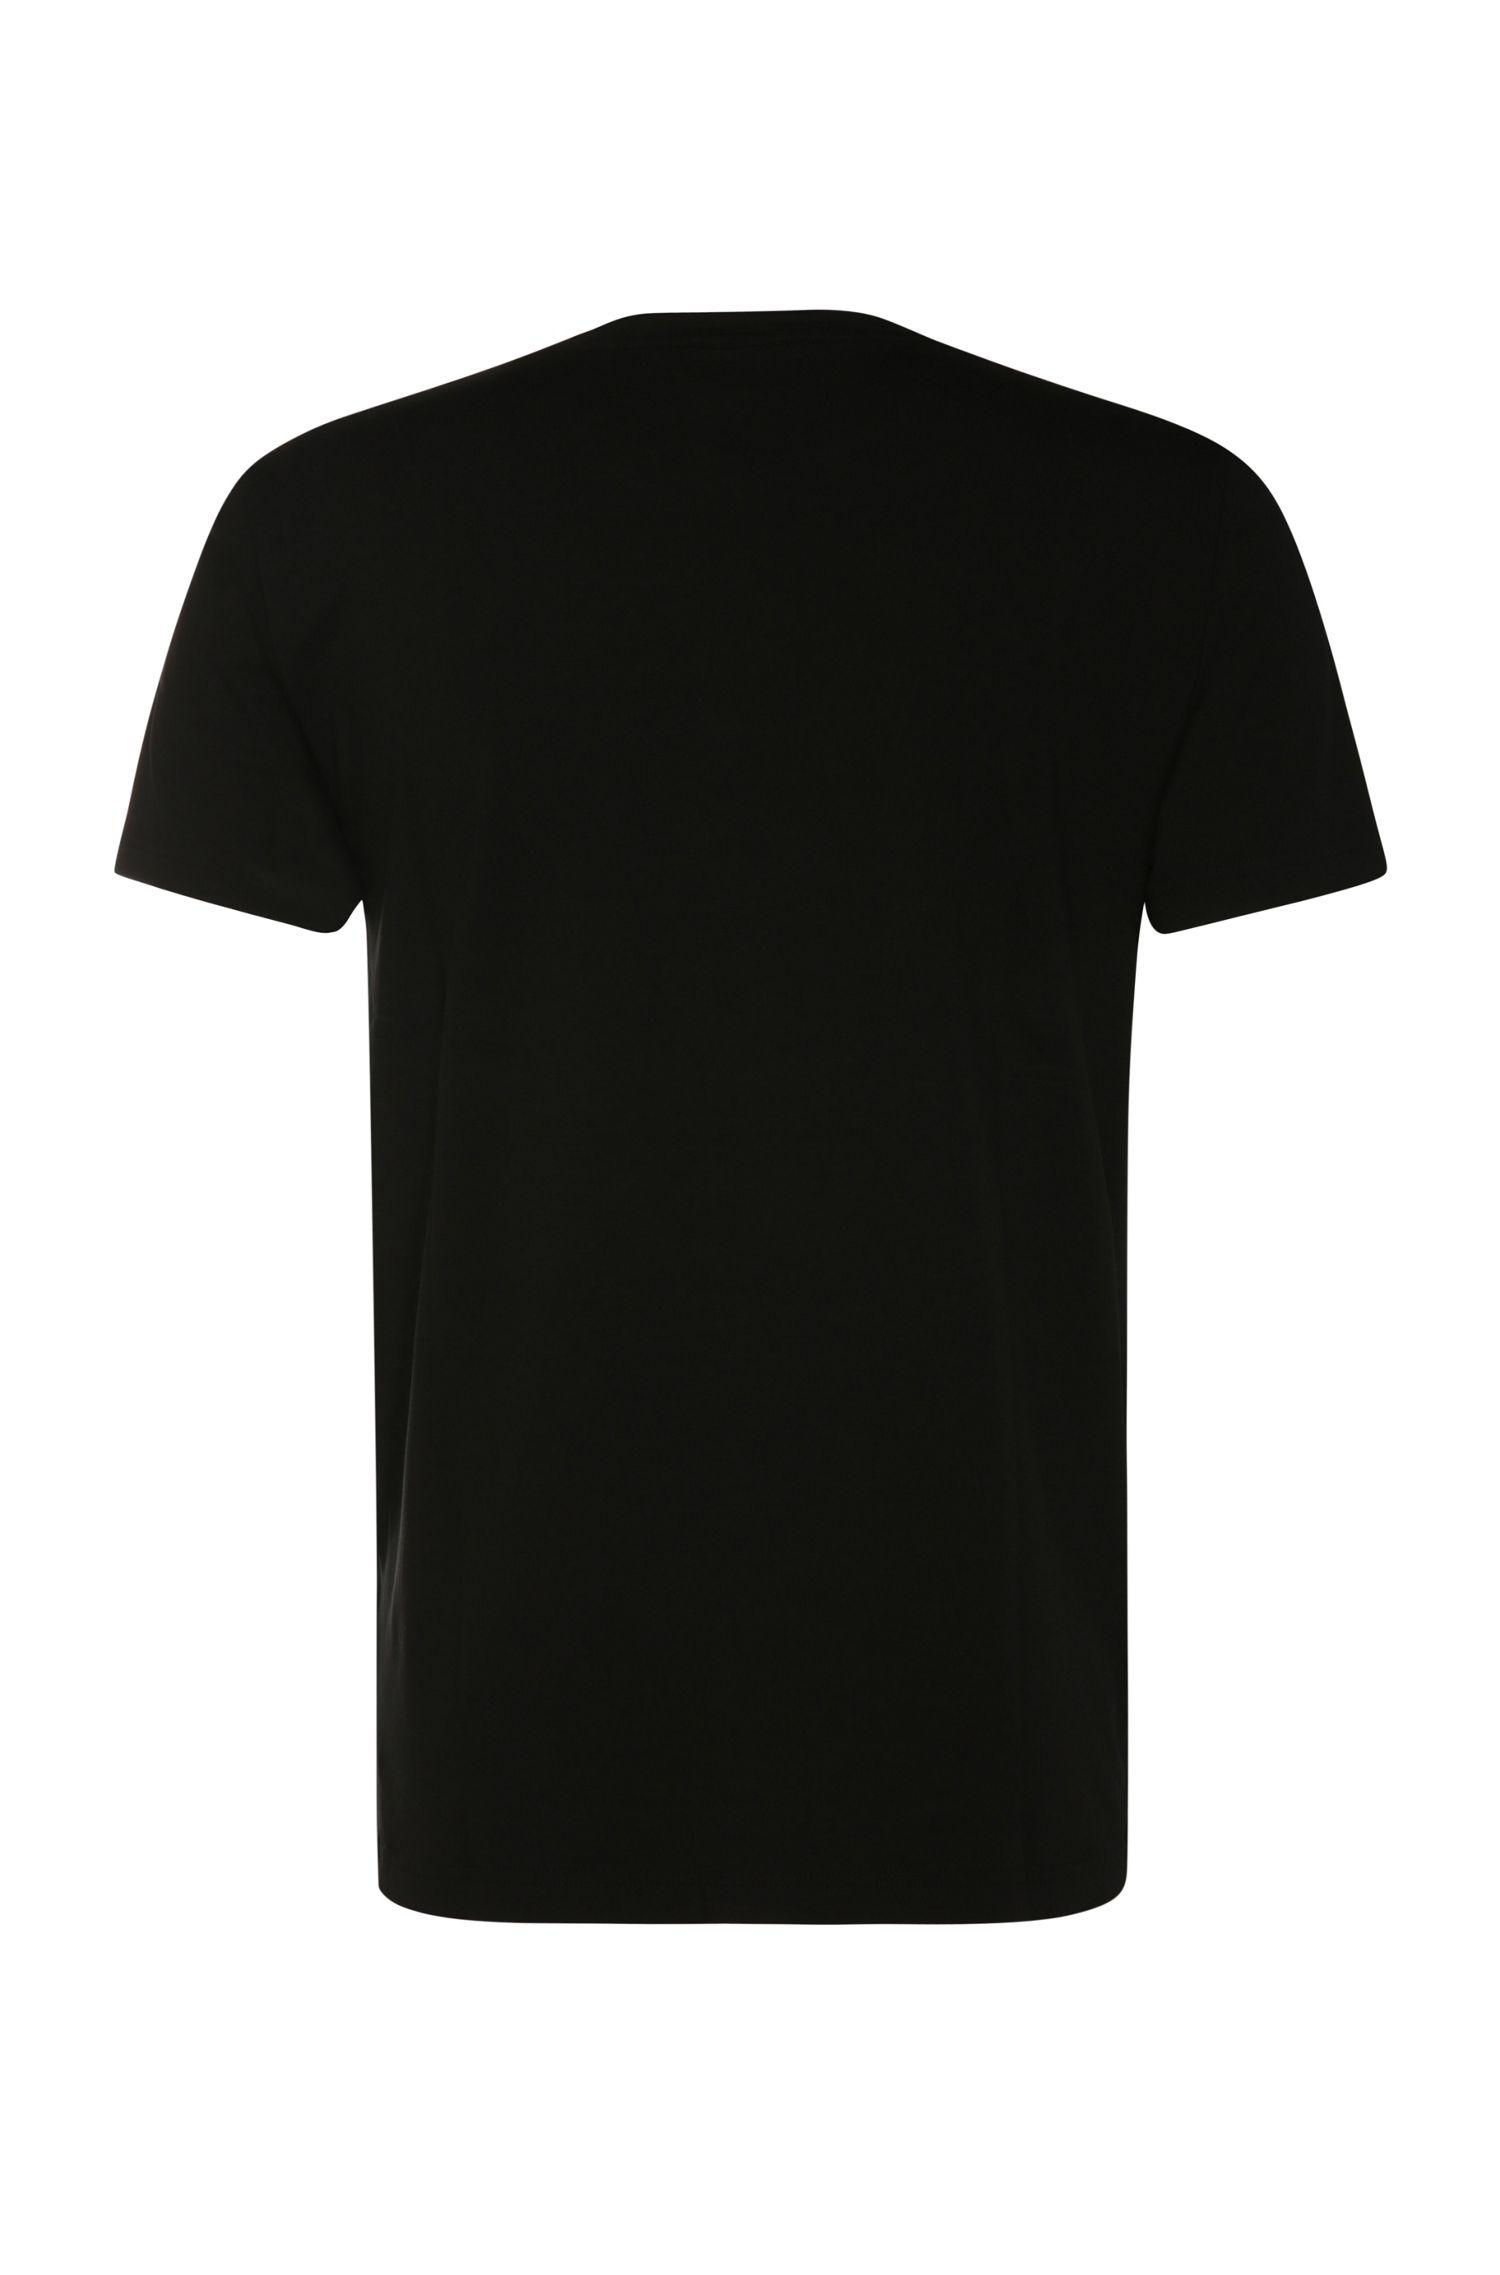 Slim-Fit Shirt aus elastischem Baumwoll-Mix: ´Teecell`